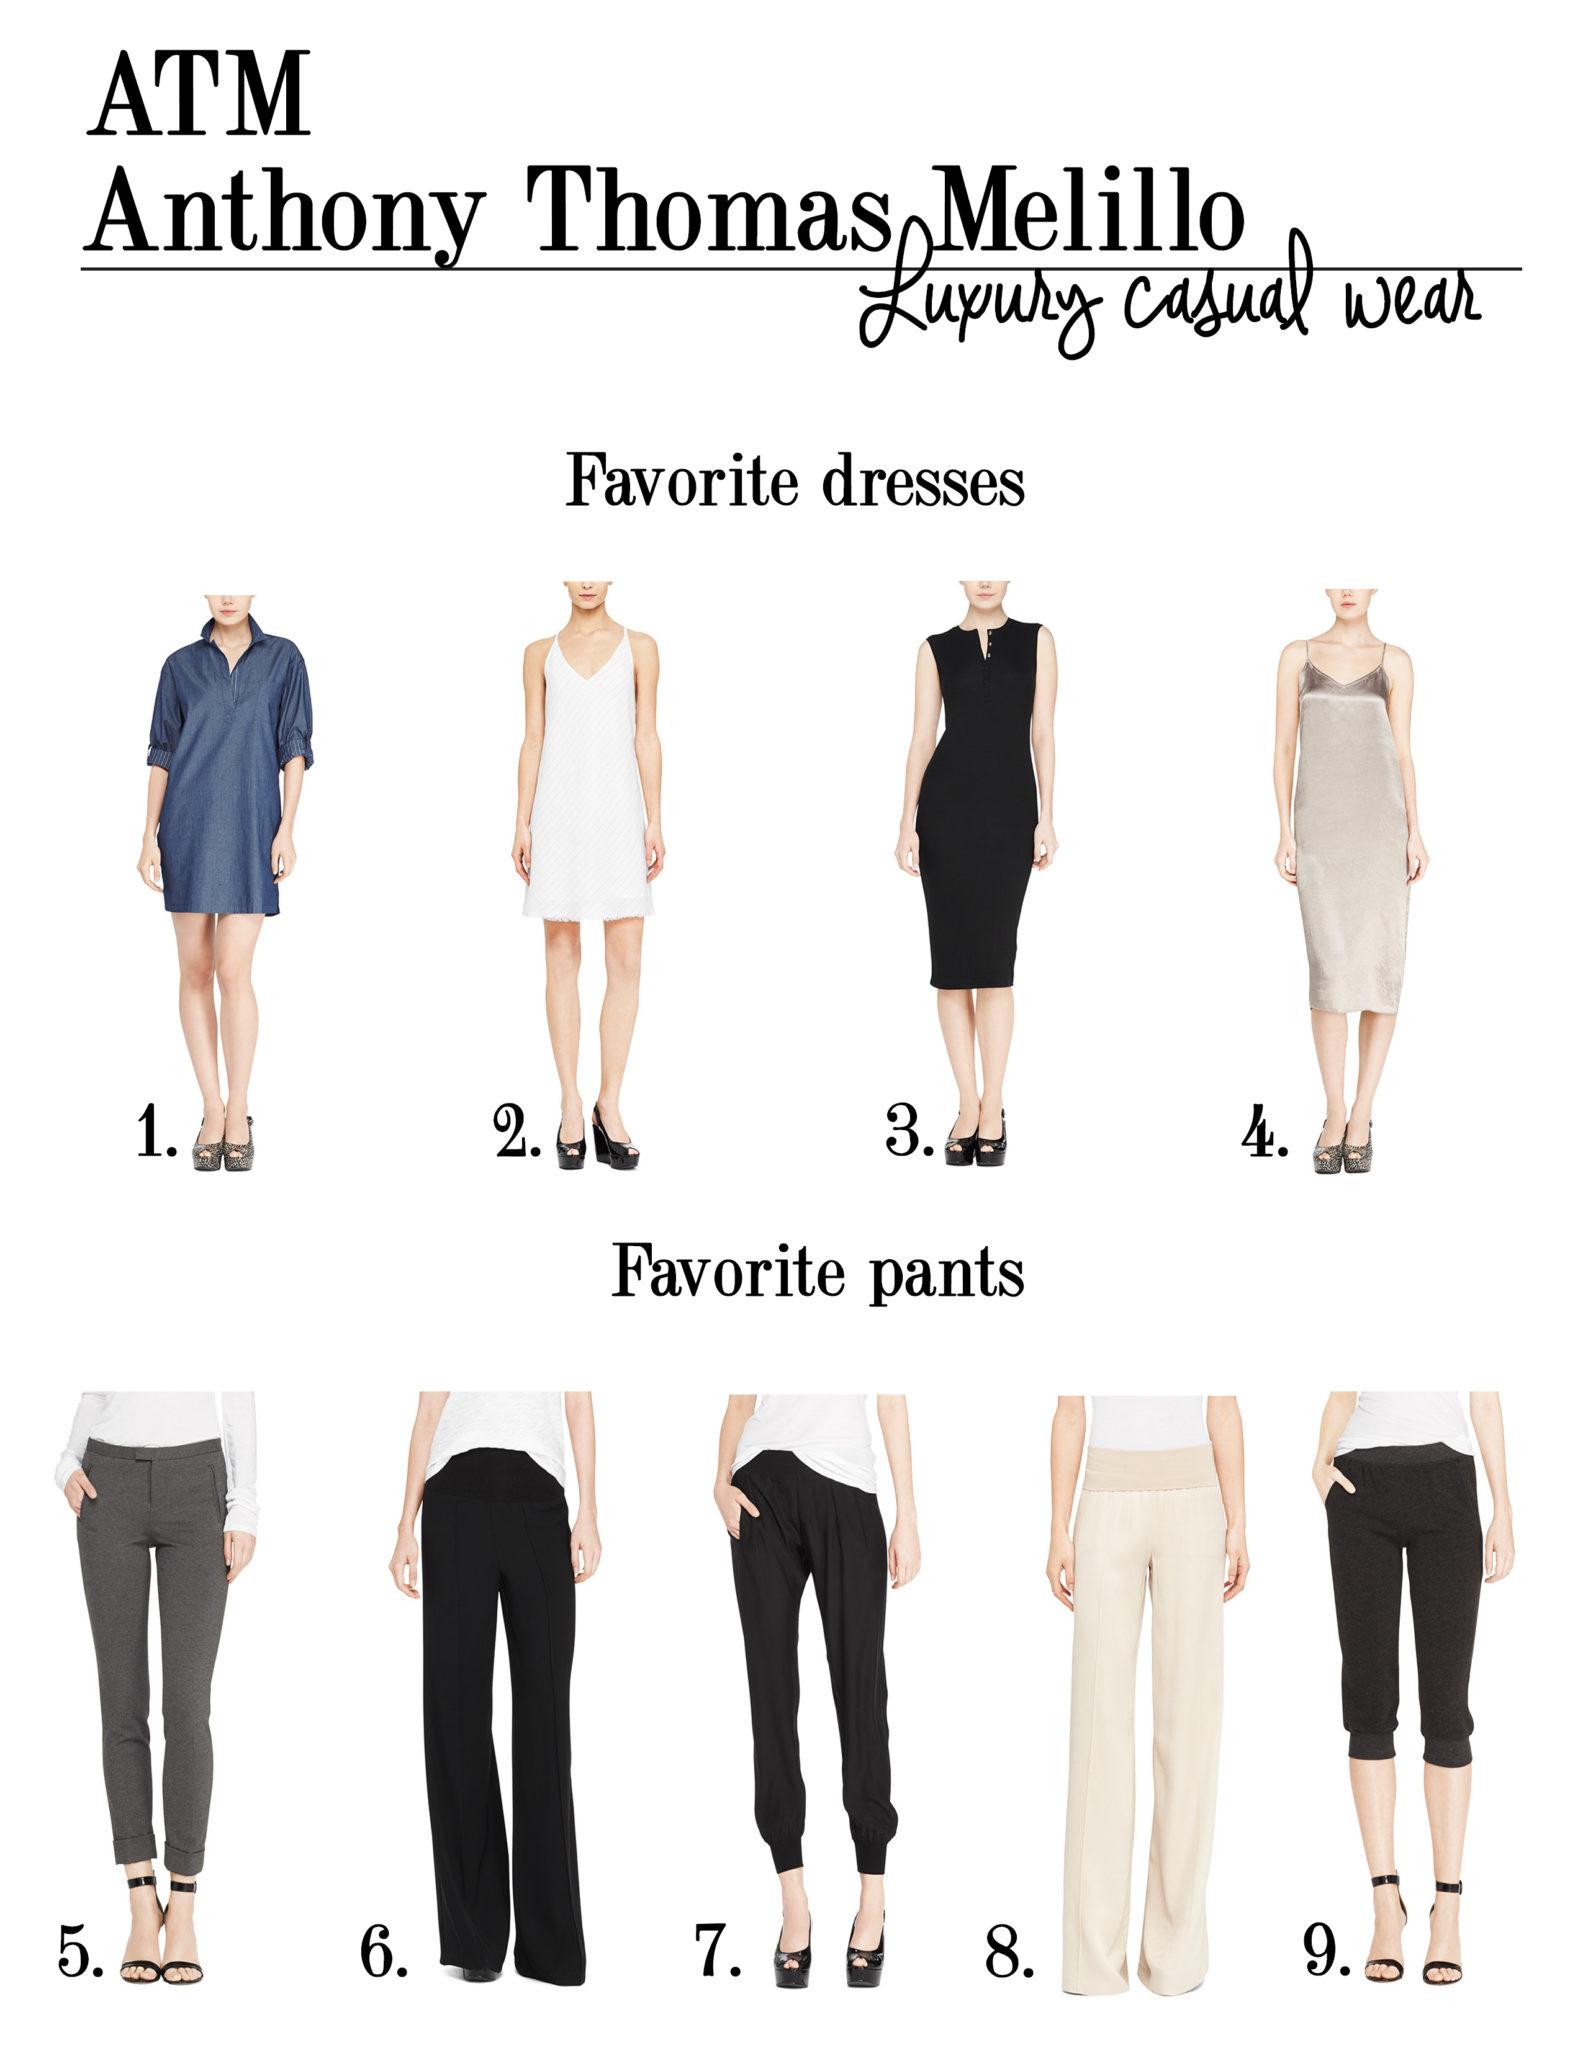 ATM Athony Thomas Meillo favorite dresses and pants